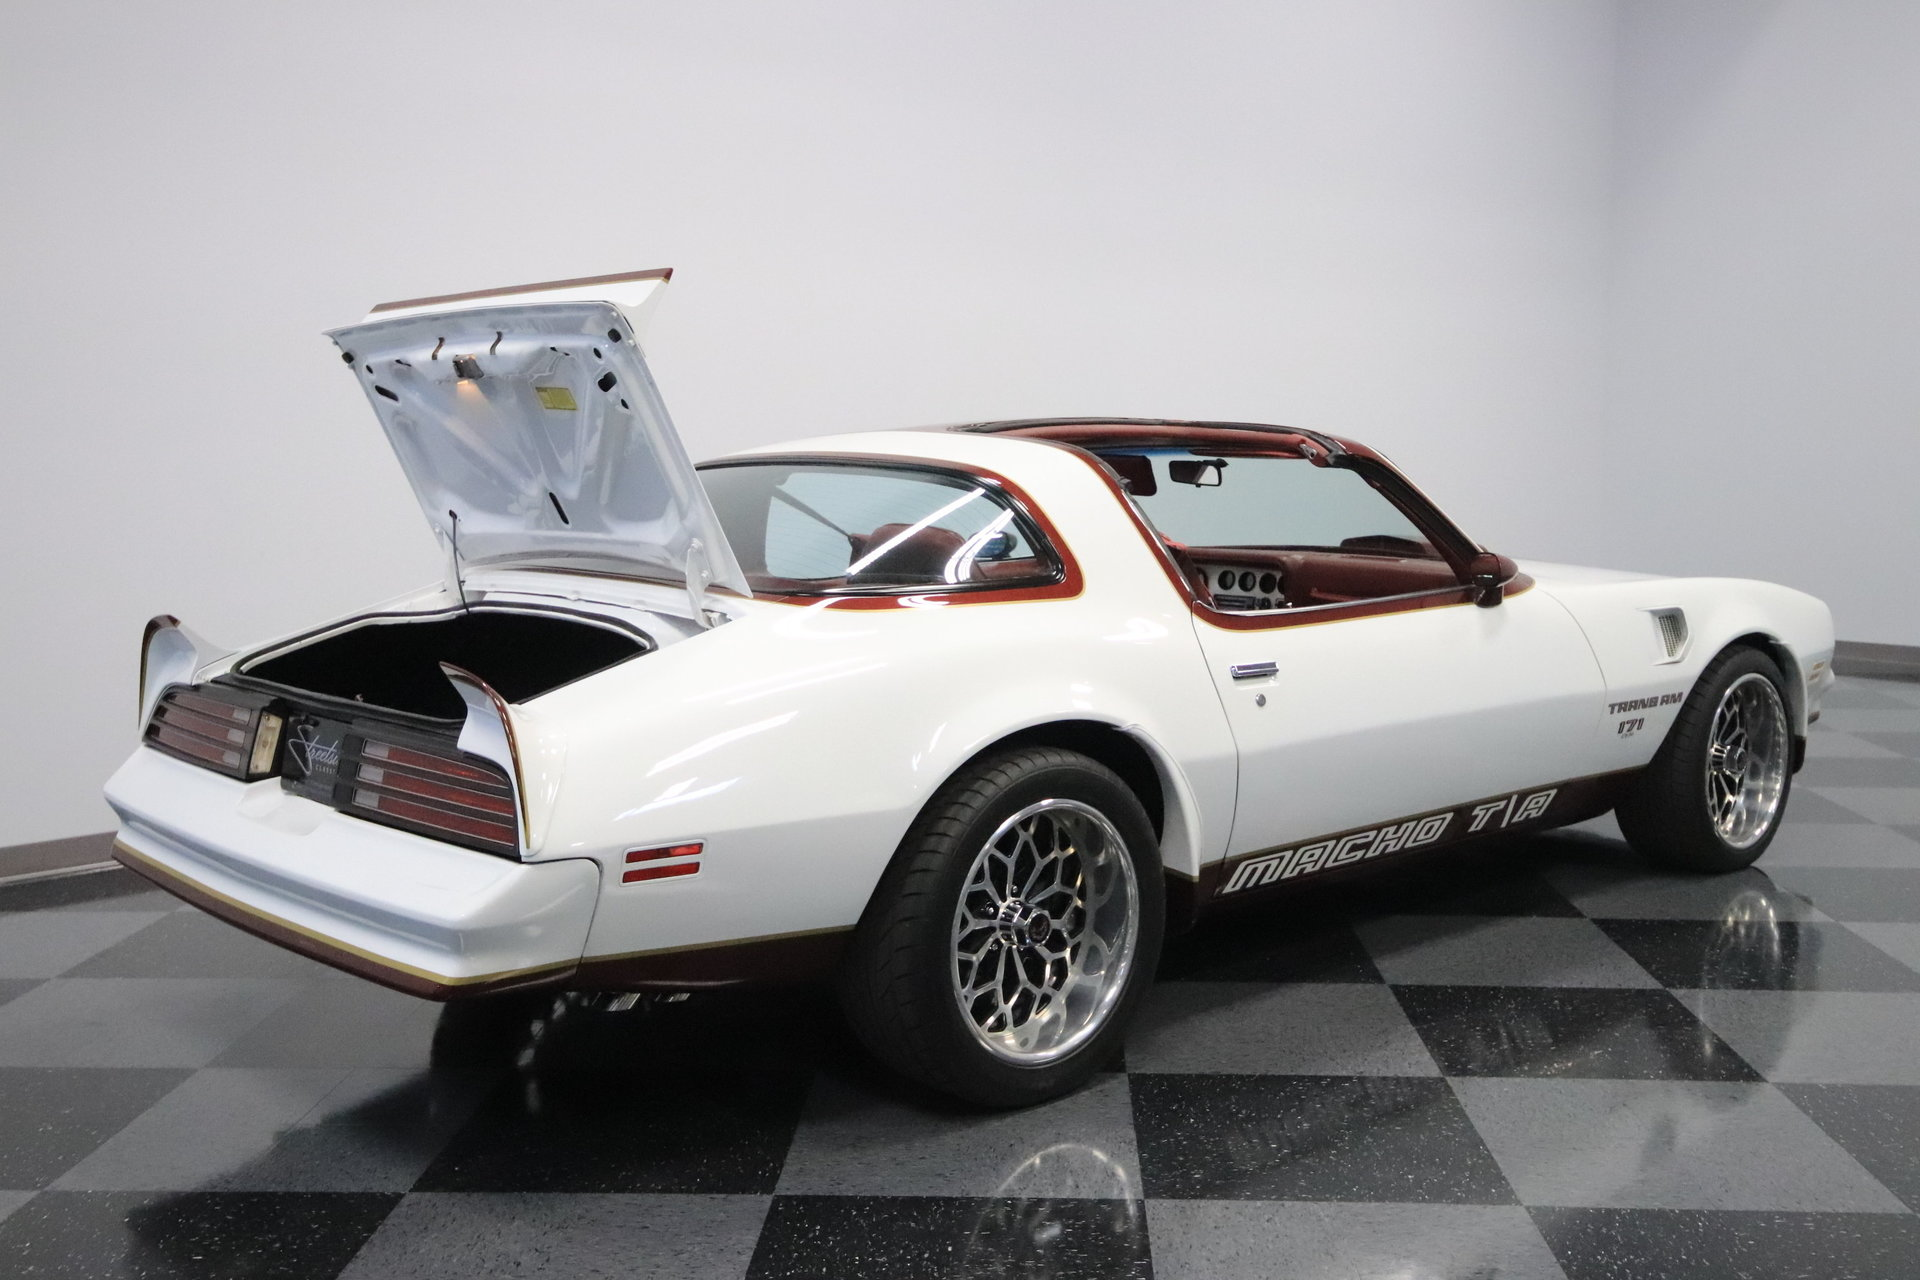 1978 pontiac firebird trans am dkm macho for sale 82921 mcg. Black Bedroom Furniture Sets. Home Design Ideas